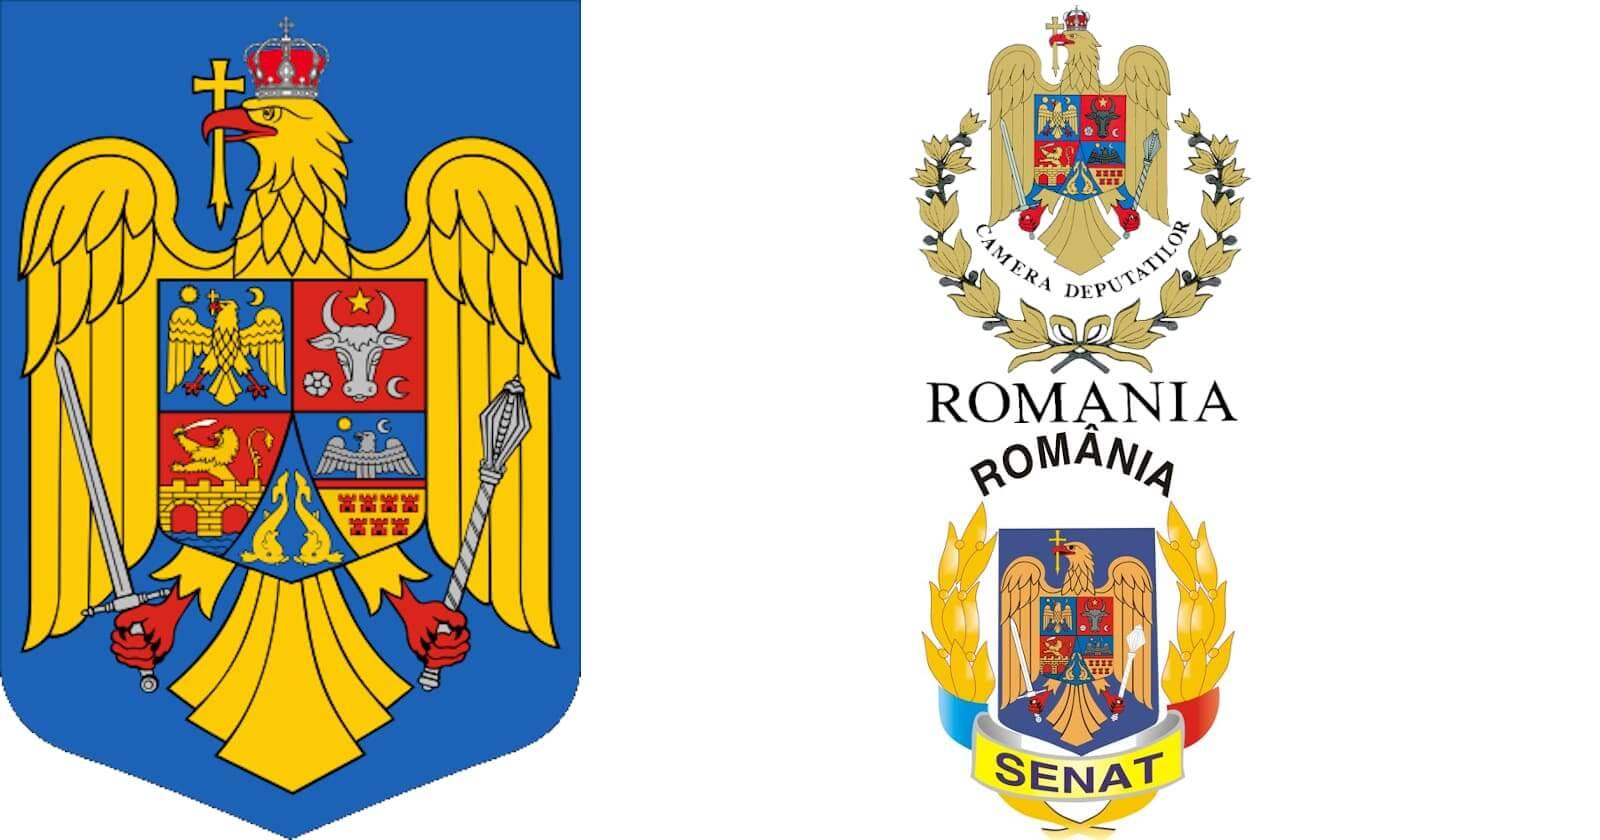 https://ziarul.romania-rationala.ro/control/articole/articole/parlamentul-romaniei-banner_6.jpg